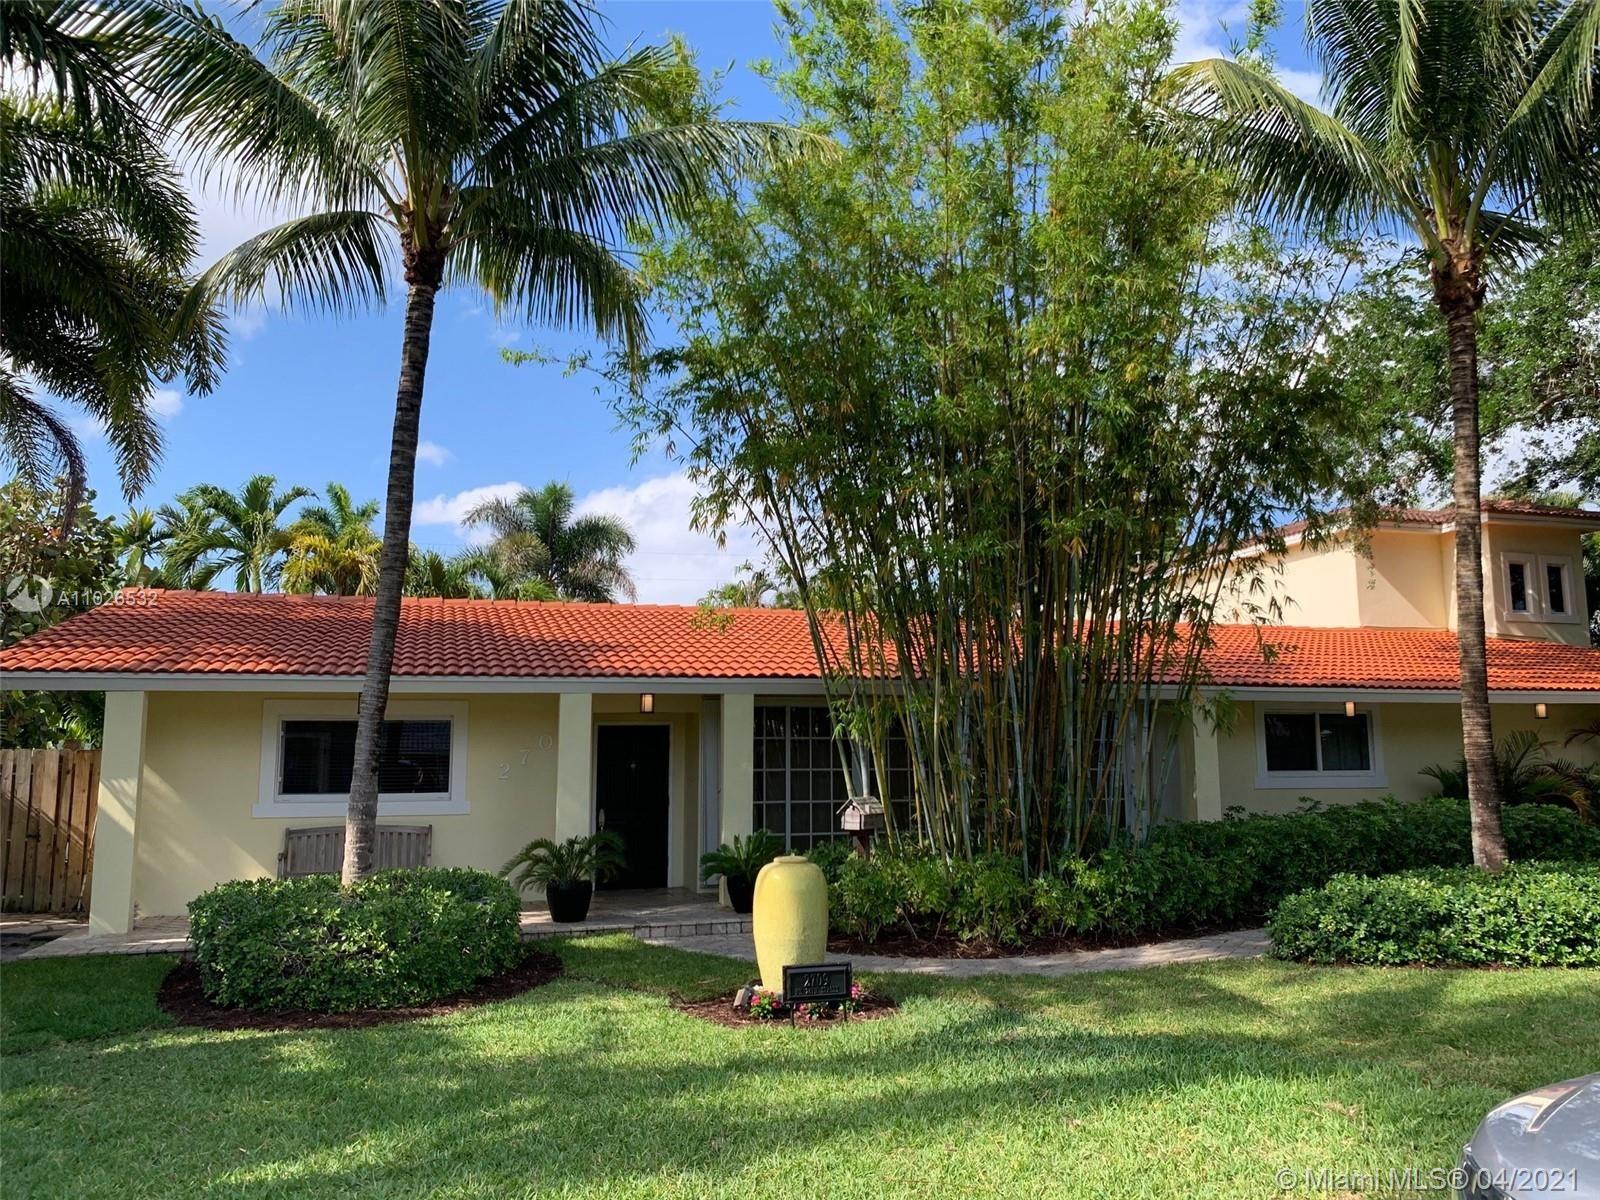 Photo of 2709 NE 28th St, Fort Lauderdale, FL 33306 (MLS # A11026532)